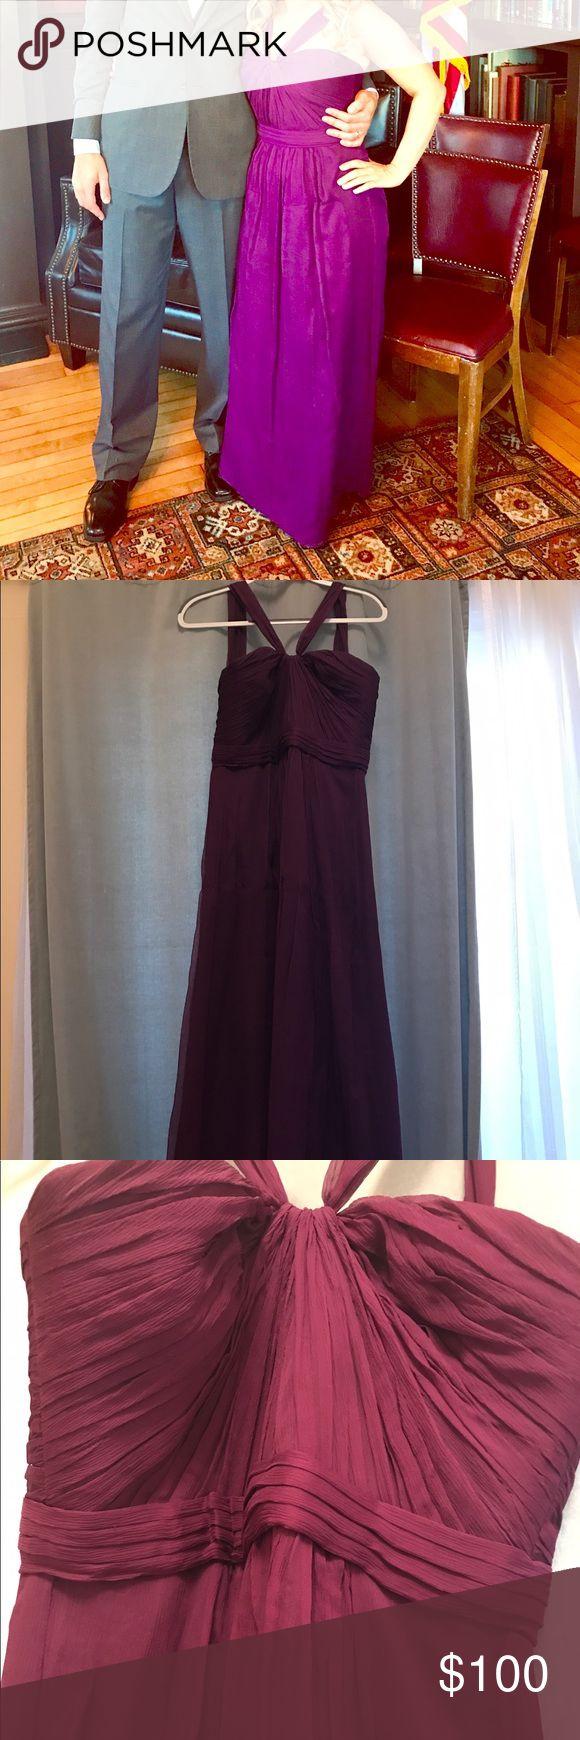 Eggplant chiffon gown - Bella's Bridesmaids Deep eggplant purple gown (petite length). Chiffon fabric and halter neckline Dresses Wedding